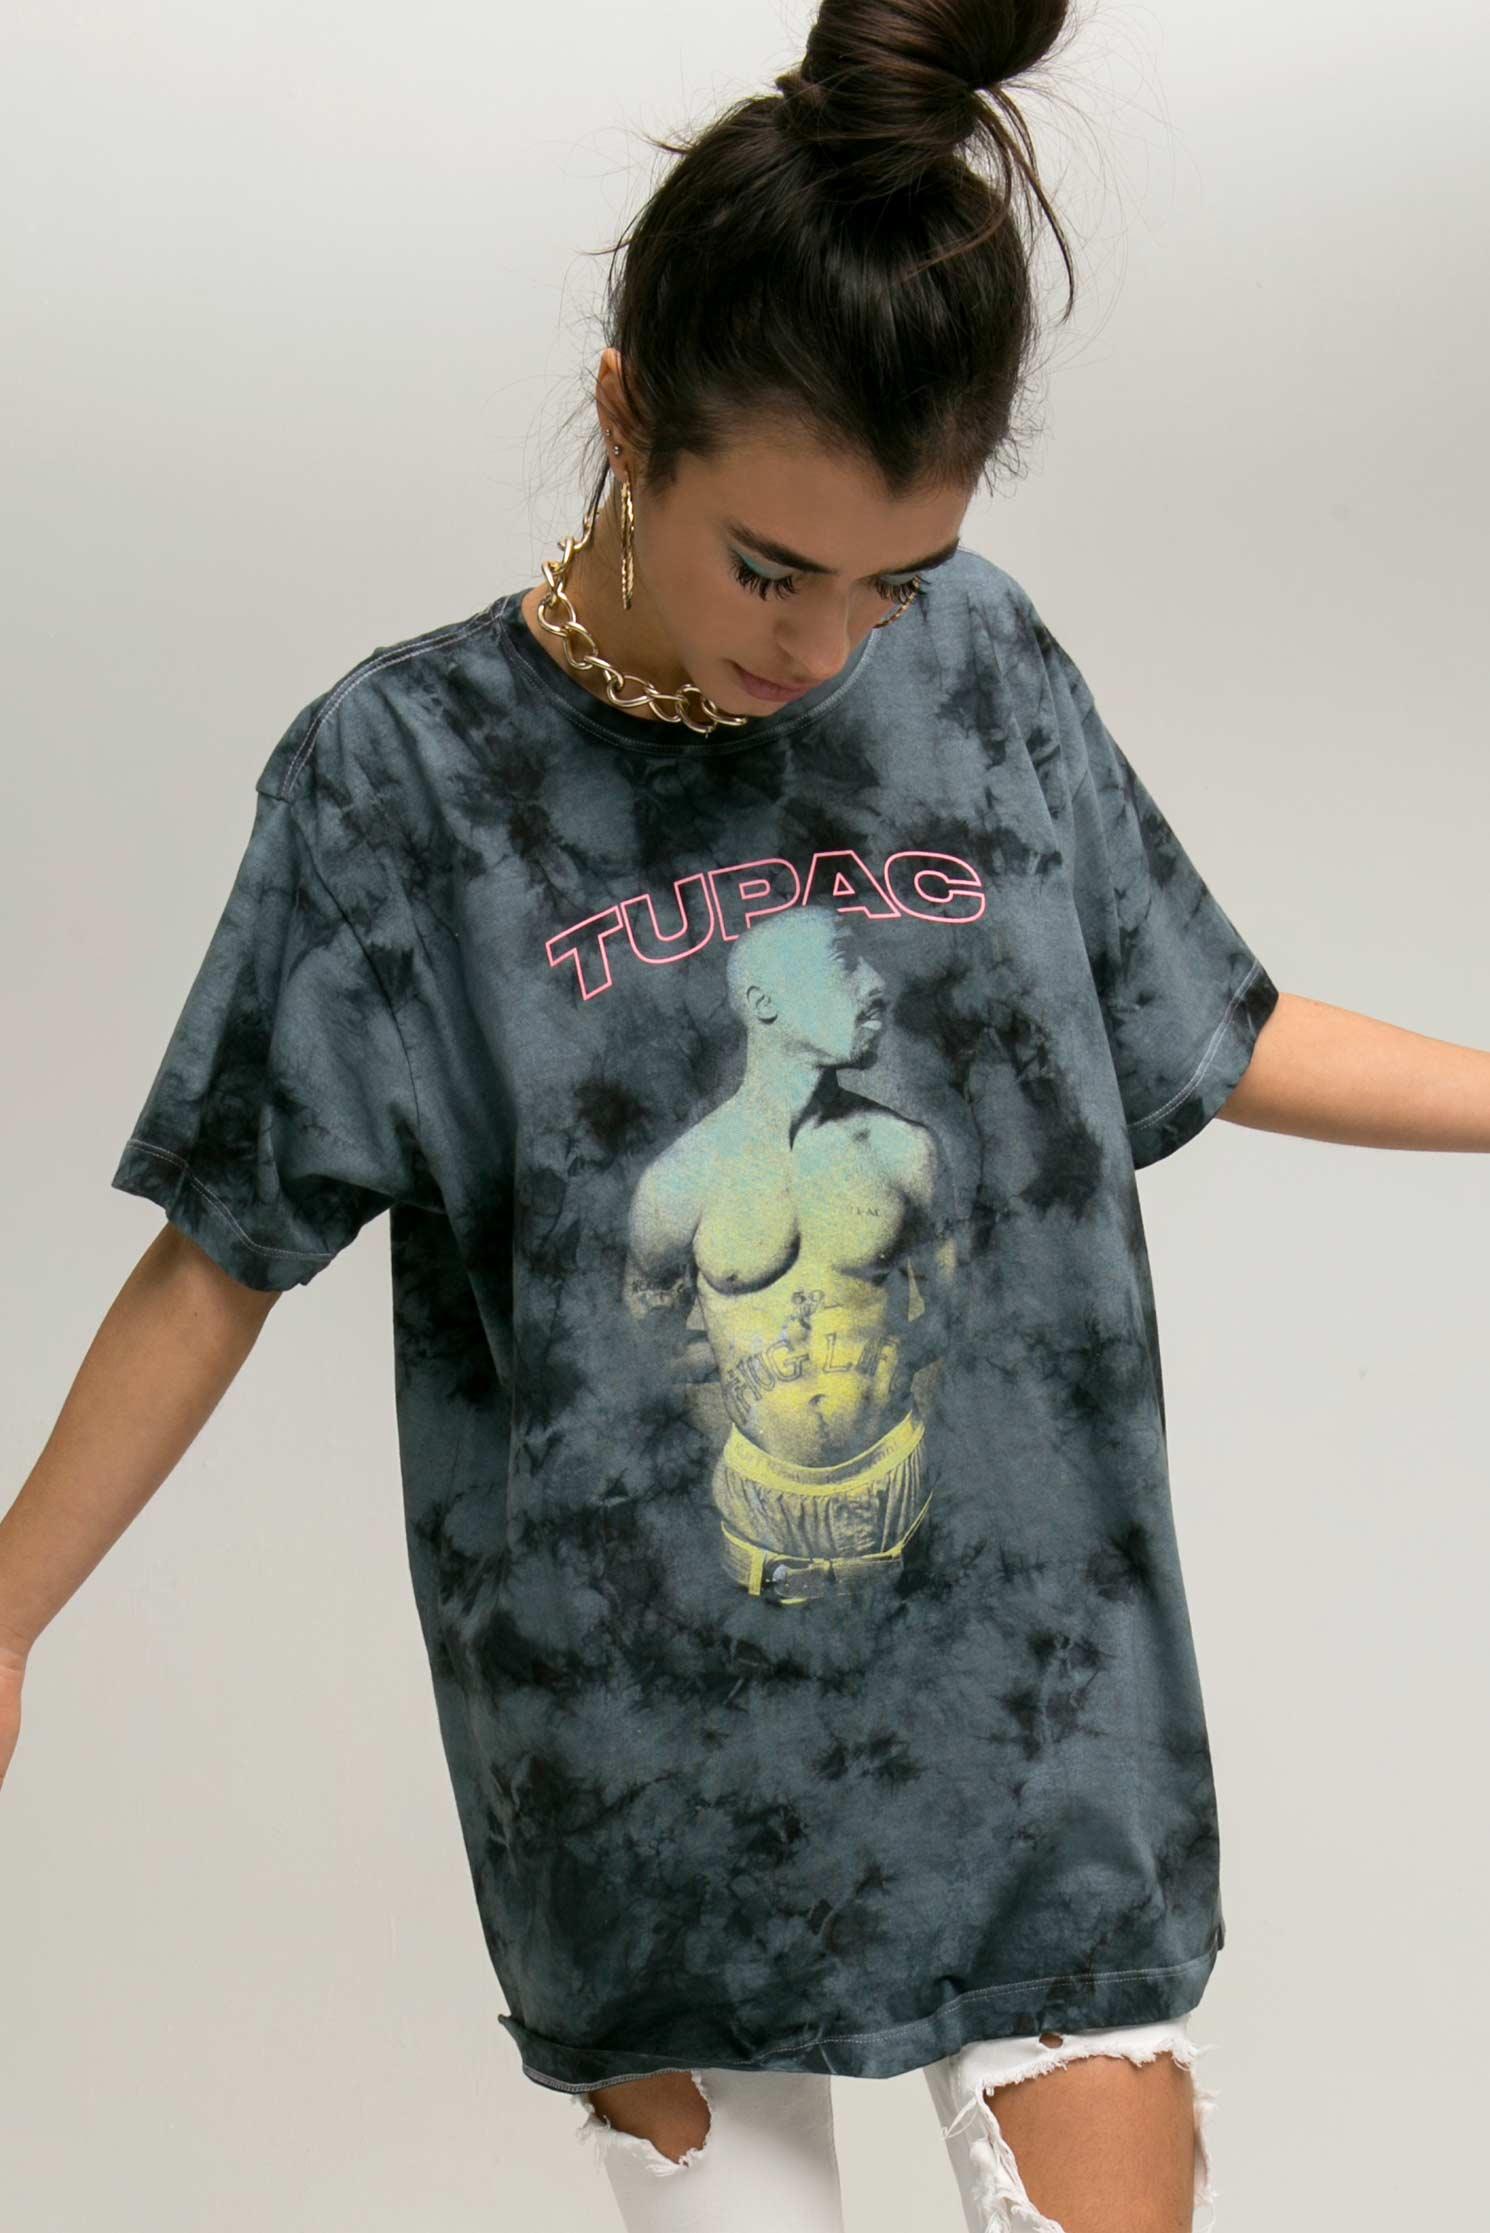 tupac-1